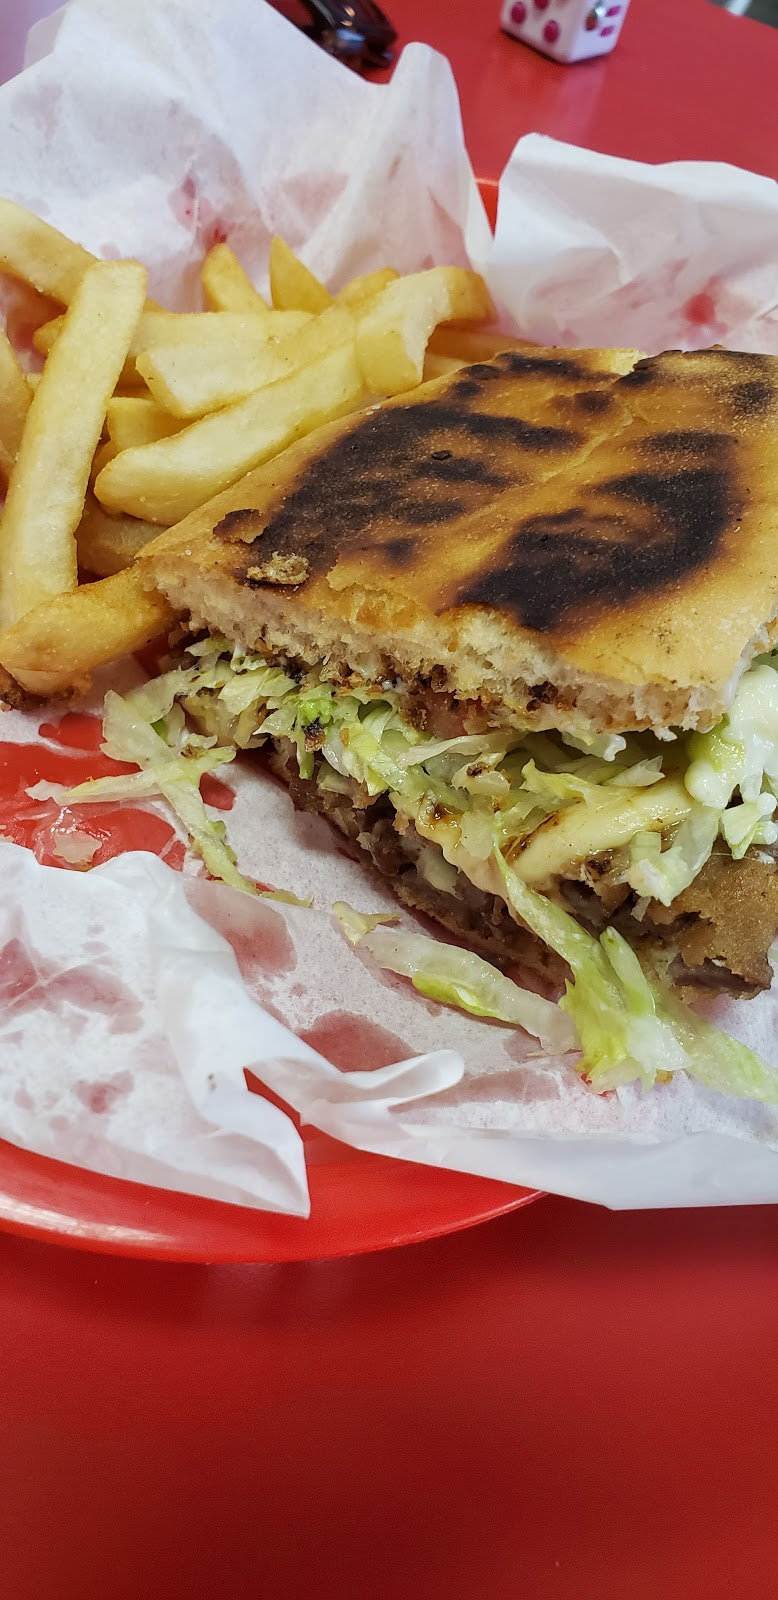 Tortas Yukon - restaurant    Photo 10 of 10   Address: 5517 McPherson Rd, Laredo, TX 78041, USA   Phone: (956) 218-8024